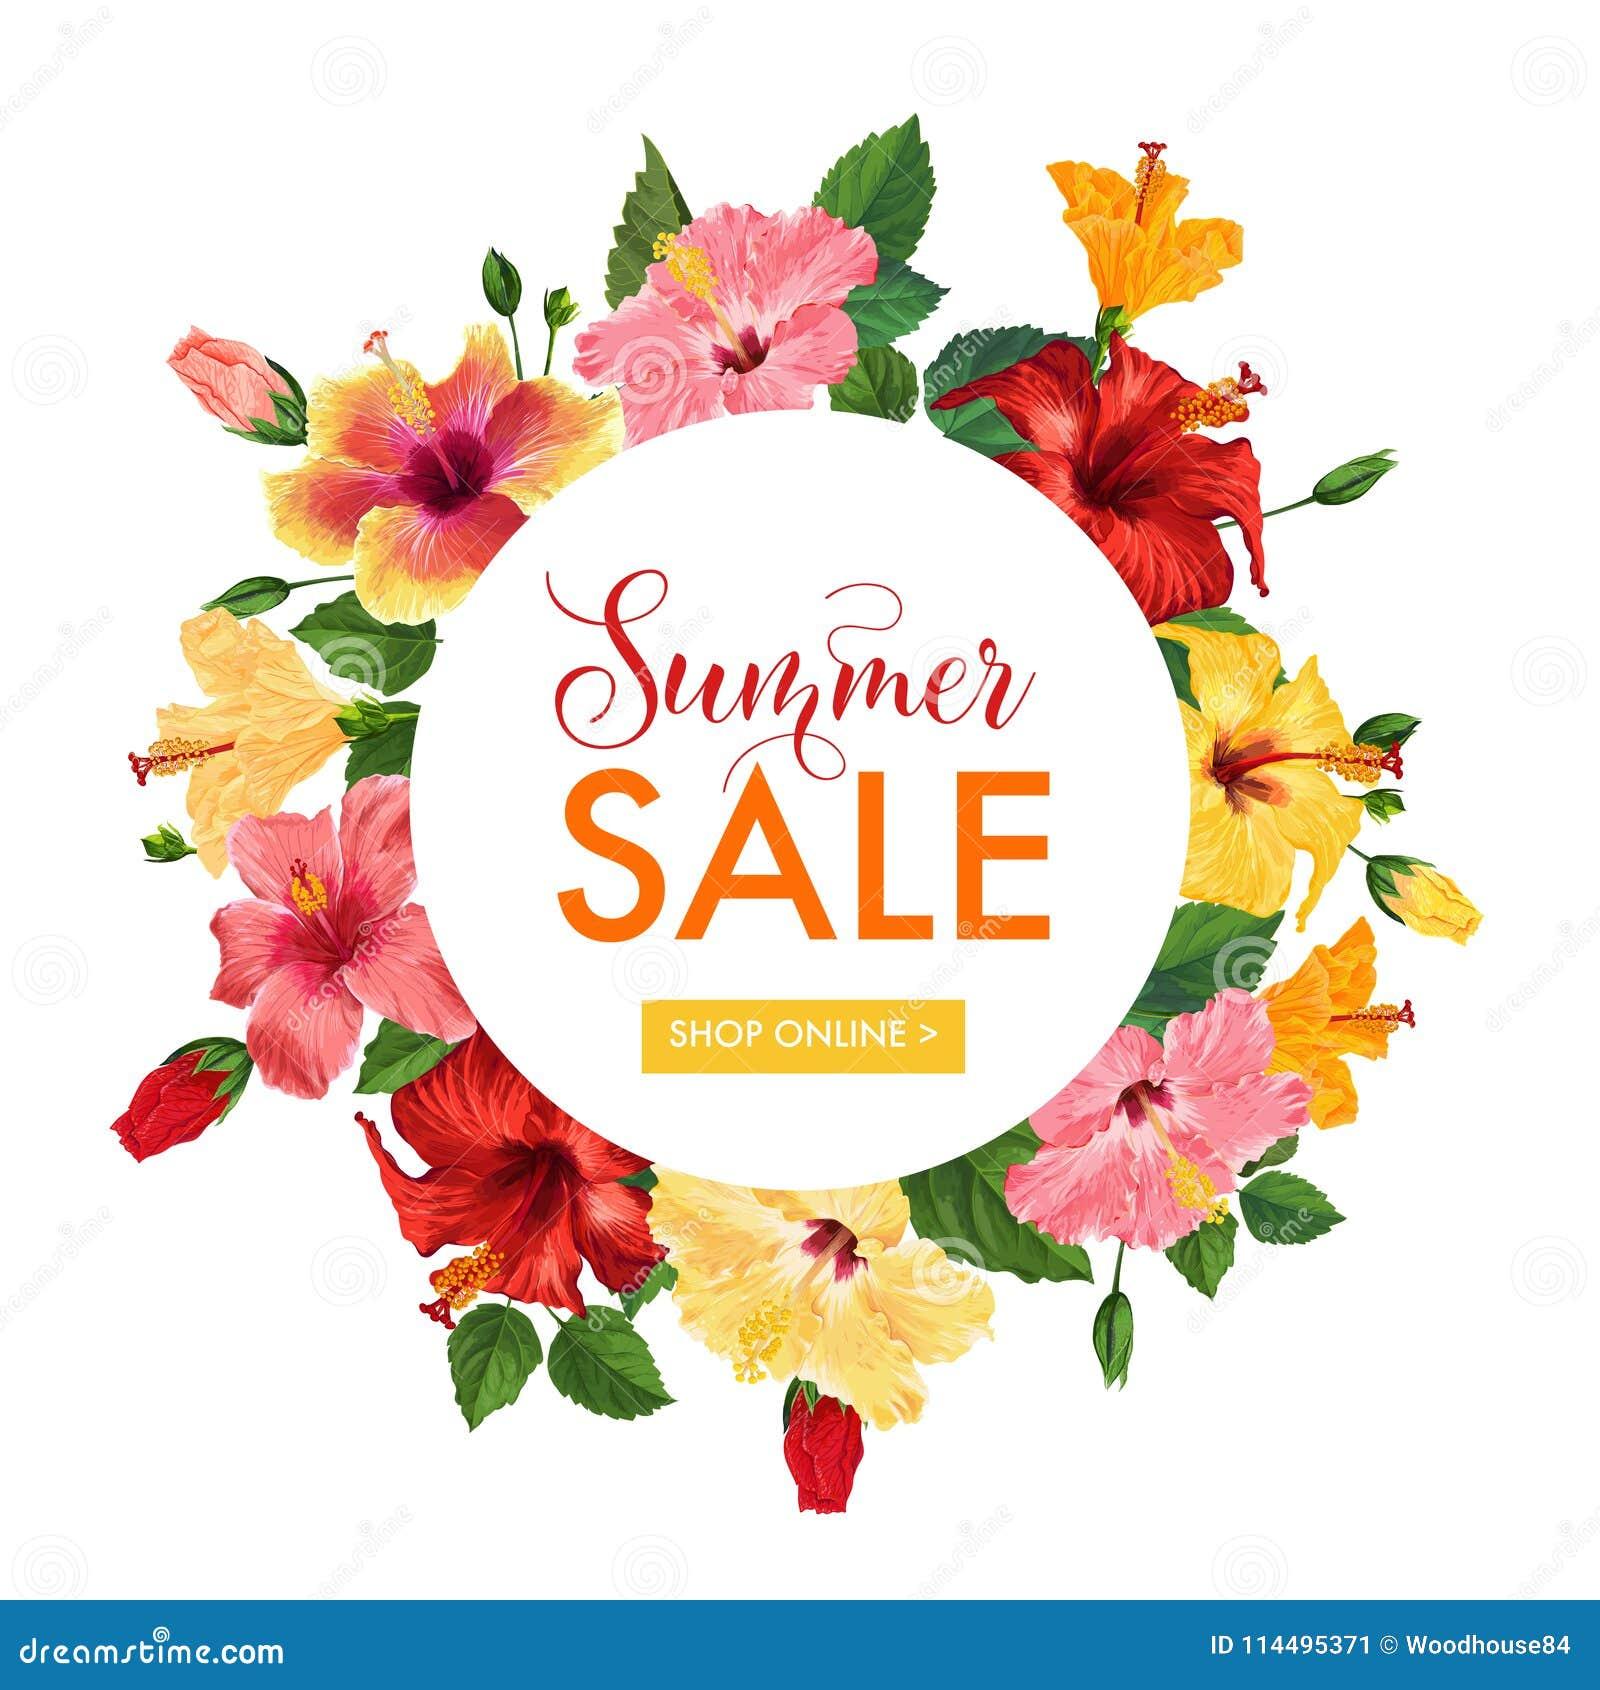 Summer sale floral banner seasonal discount advertising with red summer sale floral banner seasonal discount advertising with red hibiscus flowers tropical paradise promotional izmirmasajfo